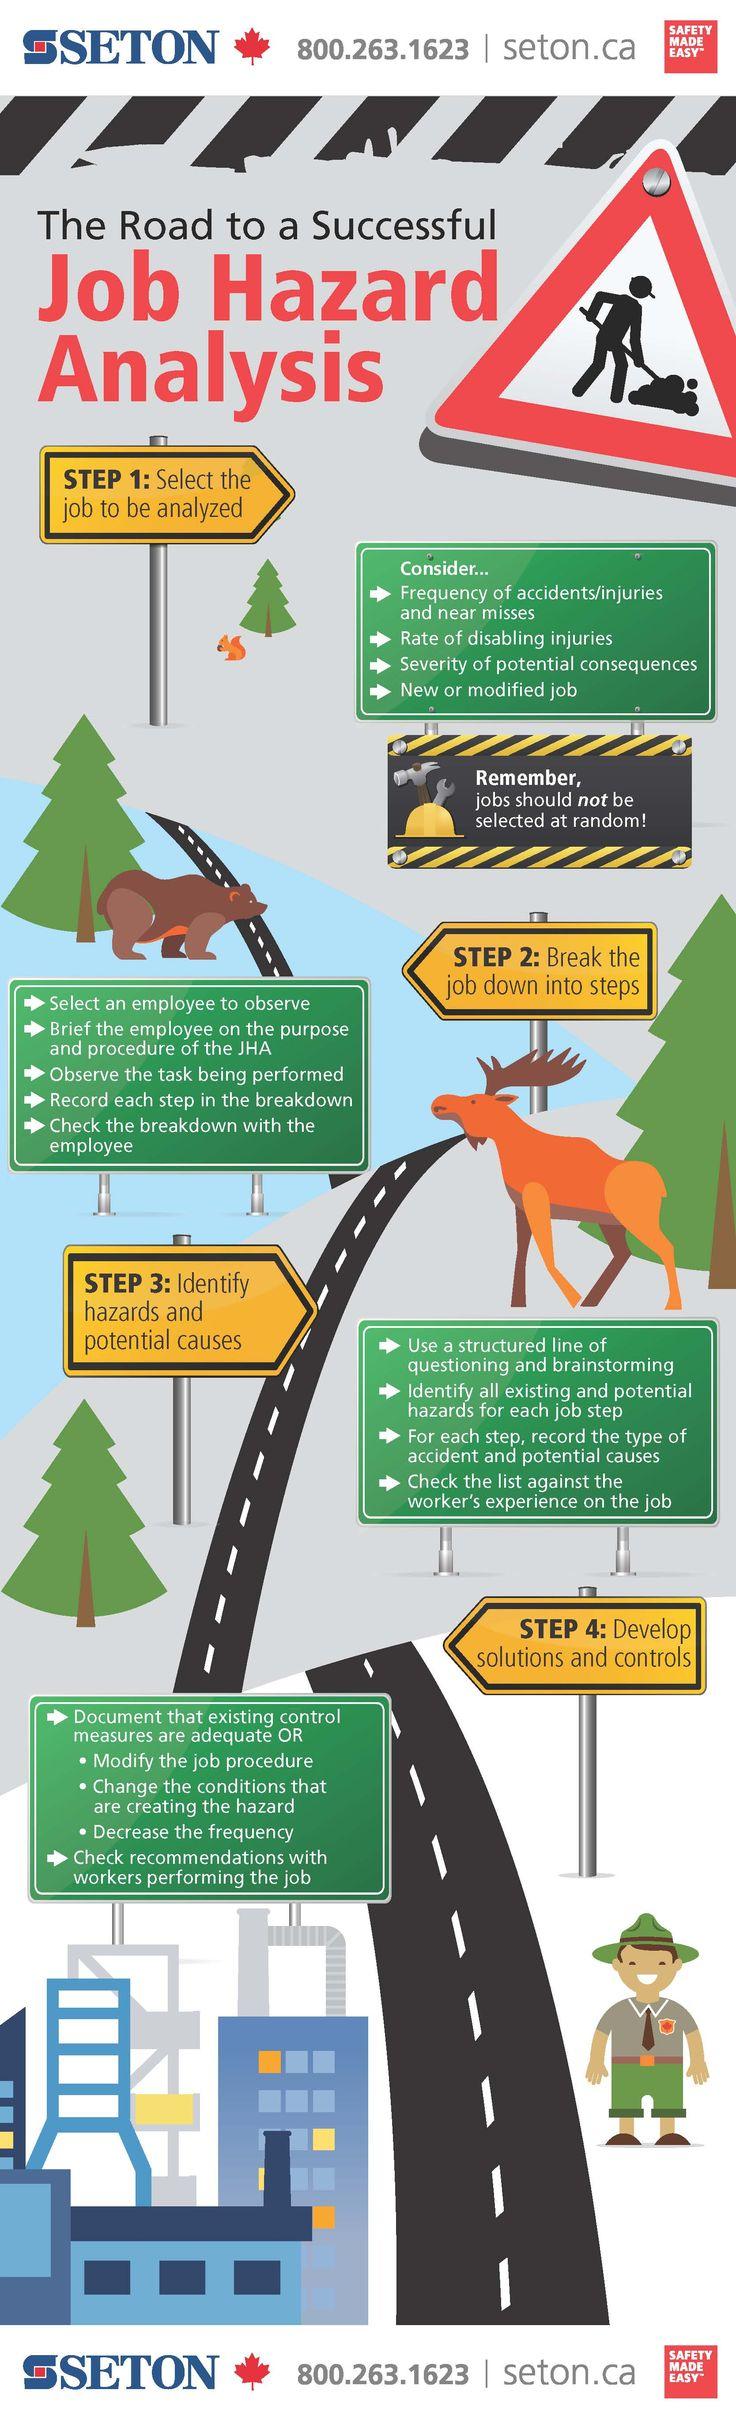 Job Hazard Analysis Infographic: Easy as 1, 2, 3…4